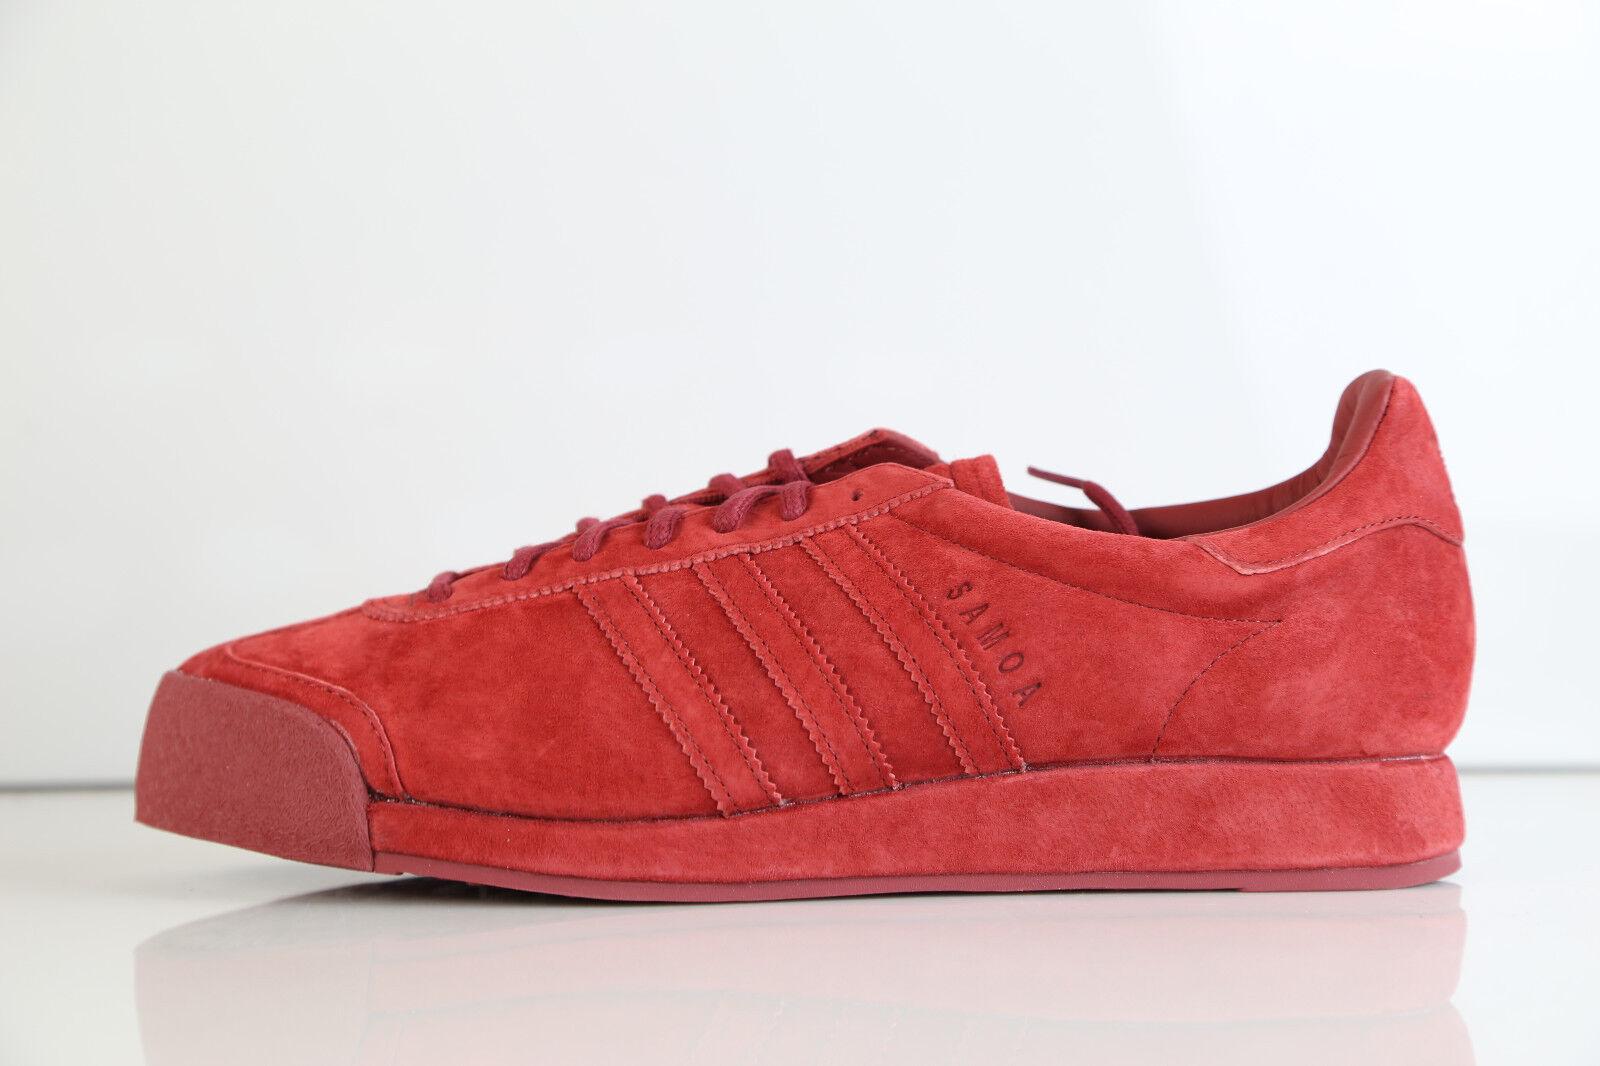 Adidas Samoa VNTG Vintage Suede Mystic rot B39016 7-13 boost rf originals